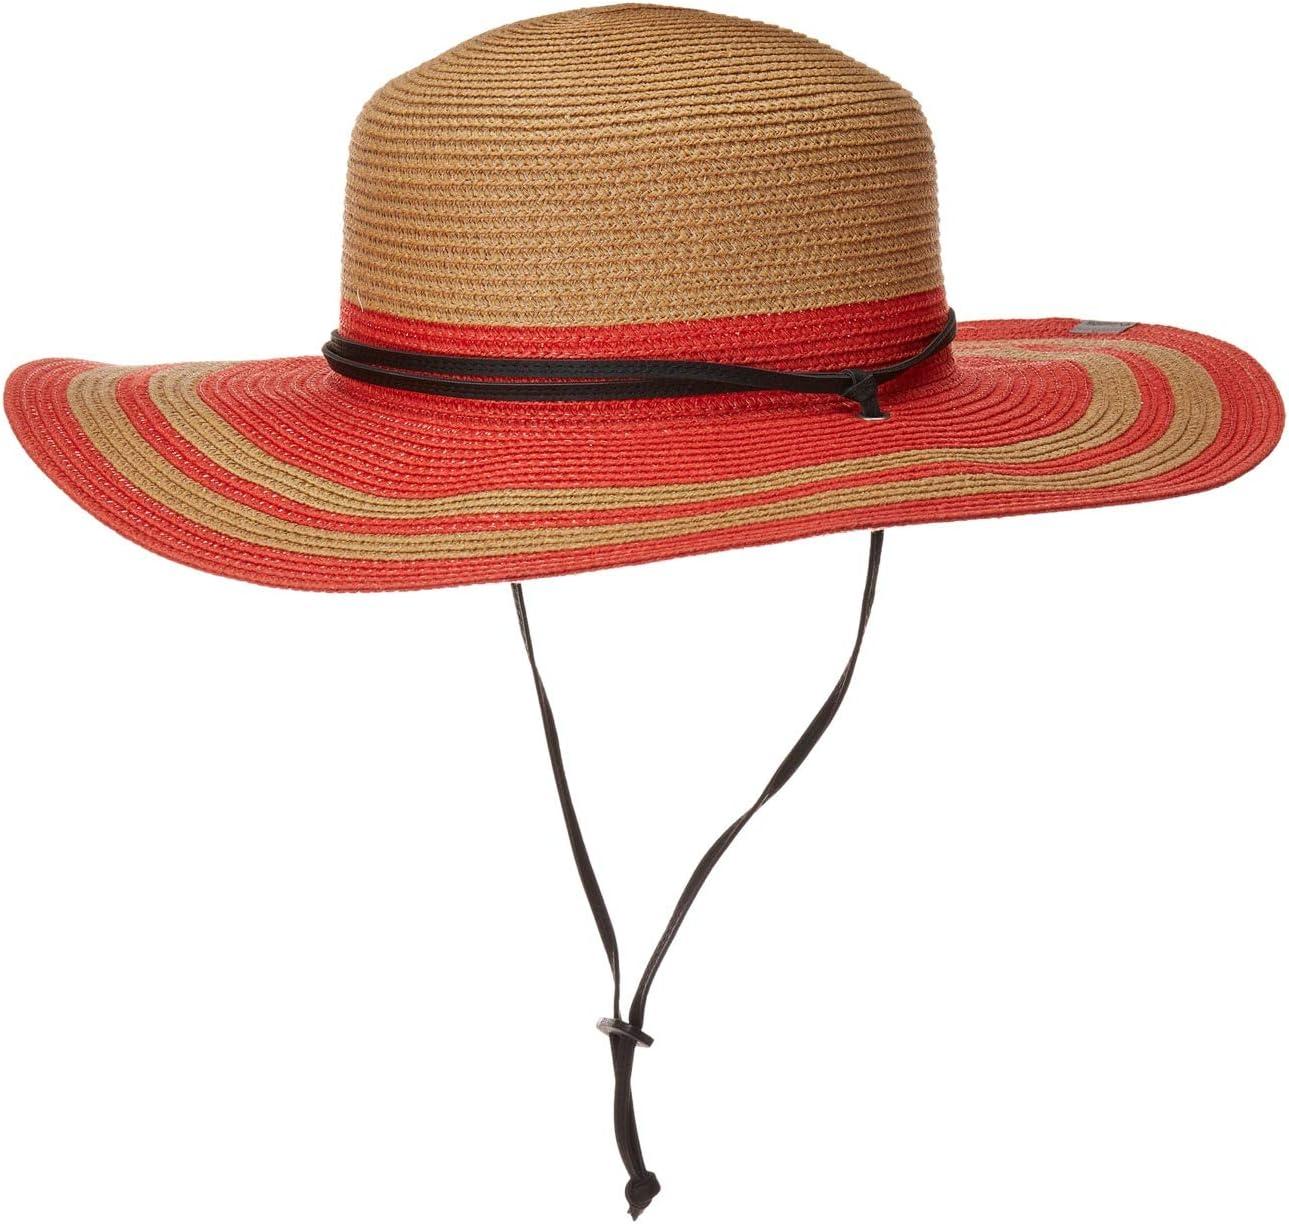 Columbia Global Adventure Packable Hat II